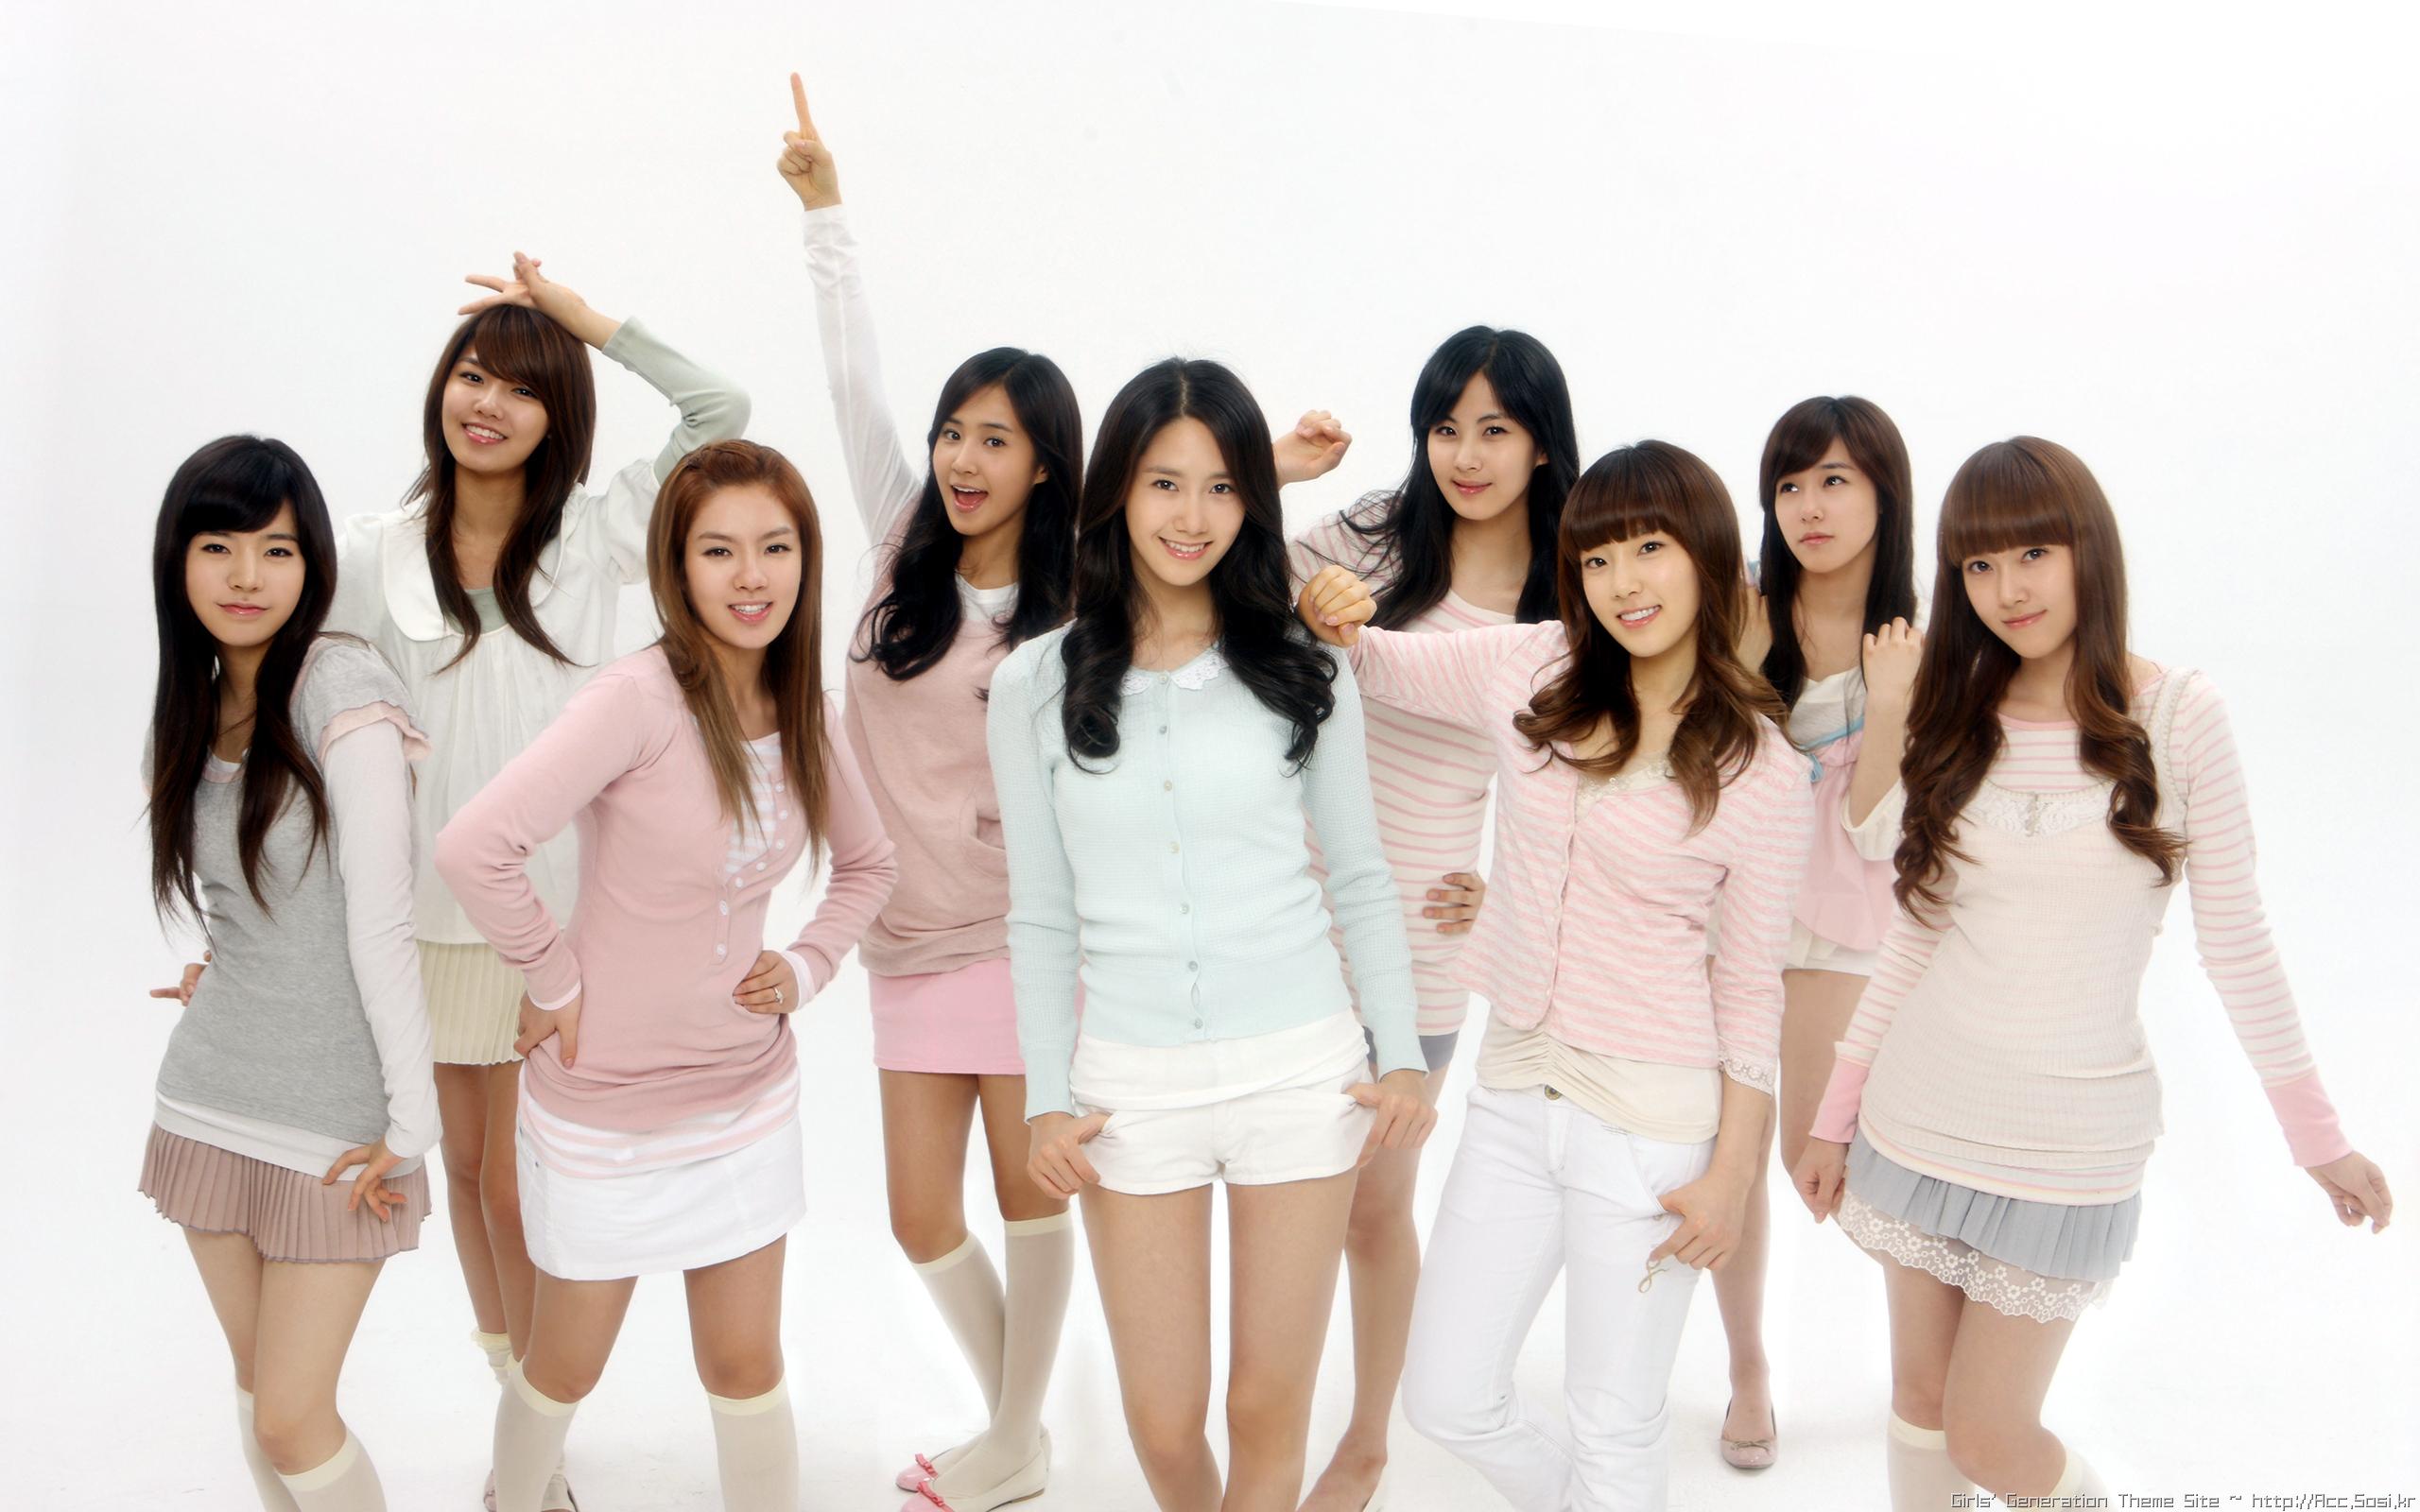 Heboh! Girl Band Korea Joged Goyang Dumang Cita Citata - YouTube